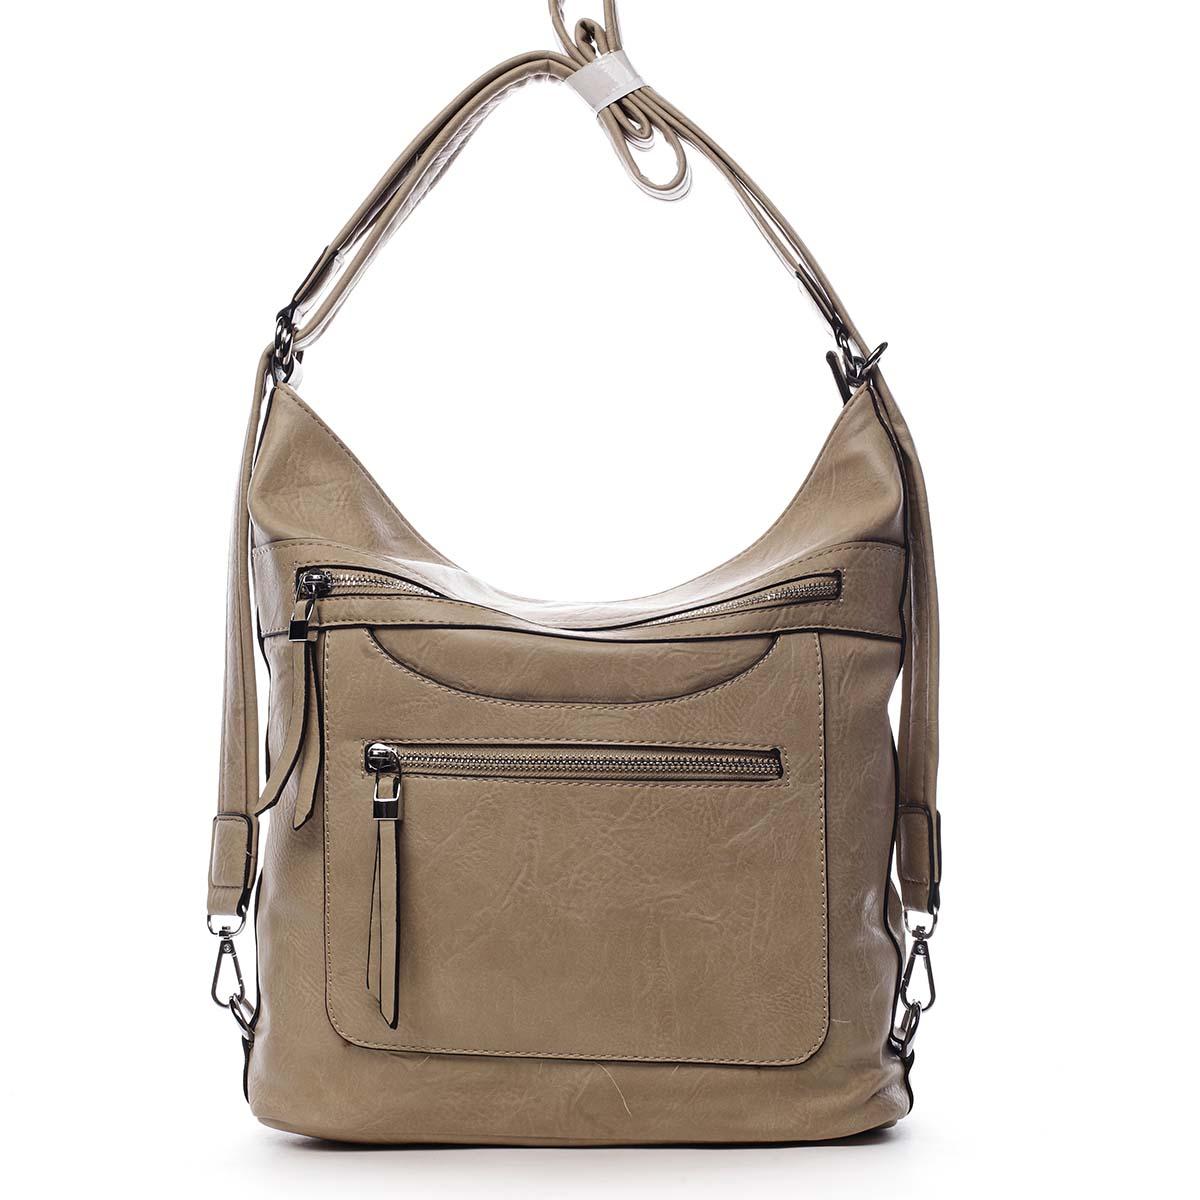 Dámska kabelka batoh béžová - Romina Pamila